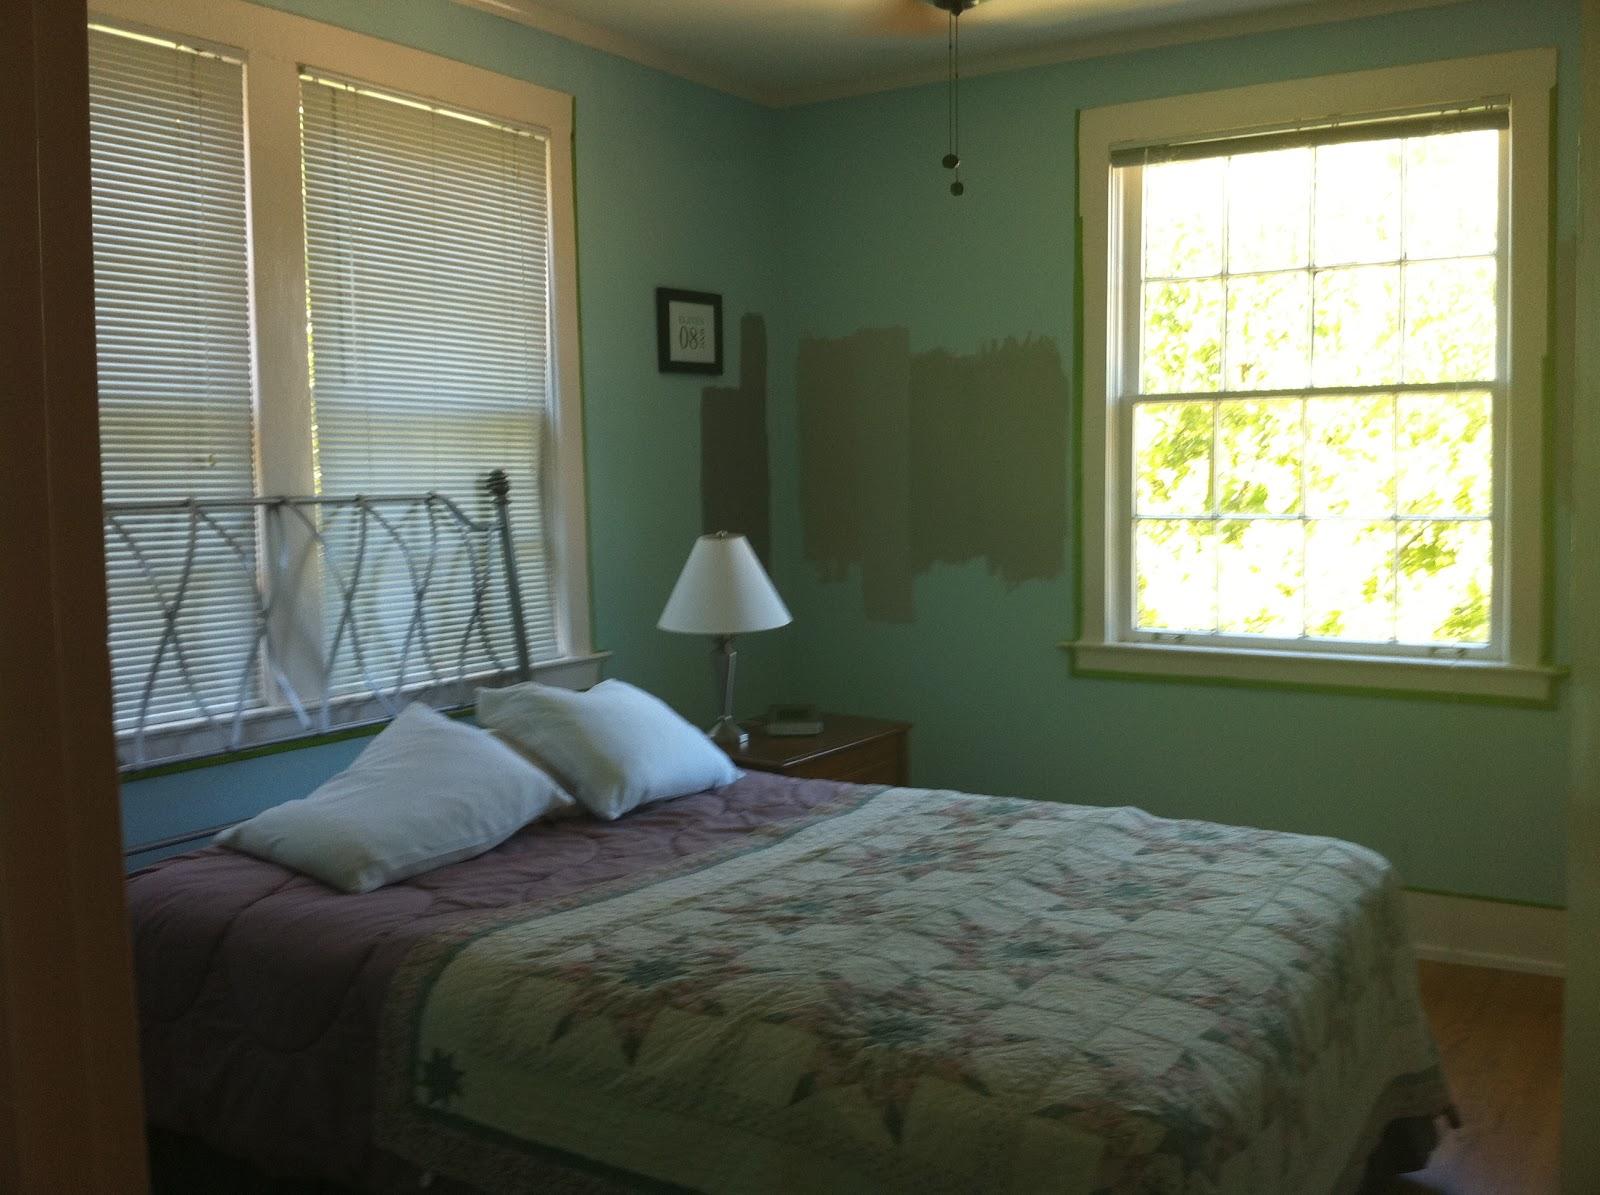 Painting My Bedroom